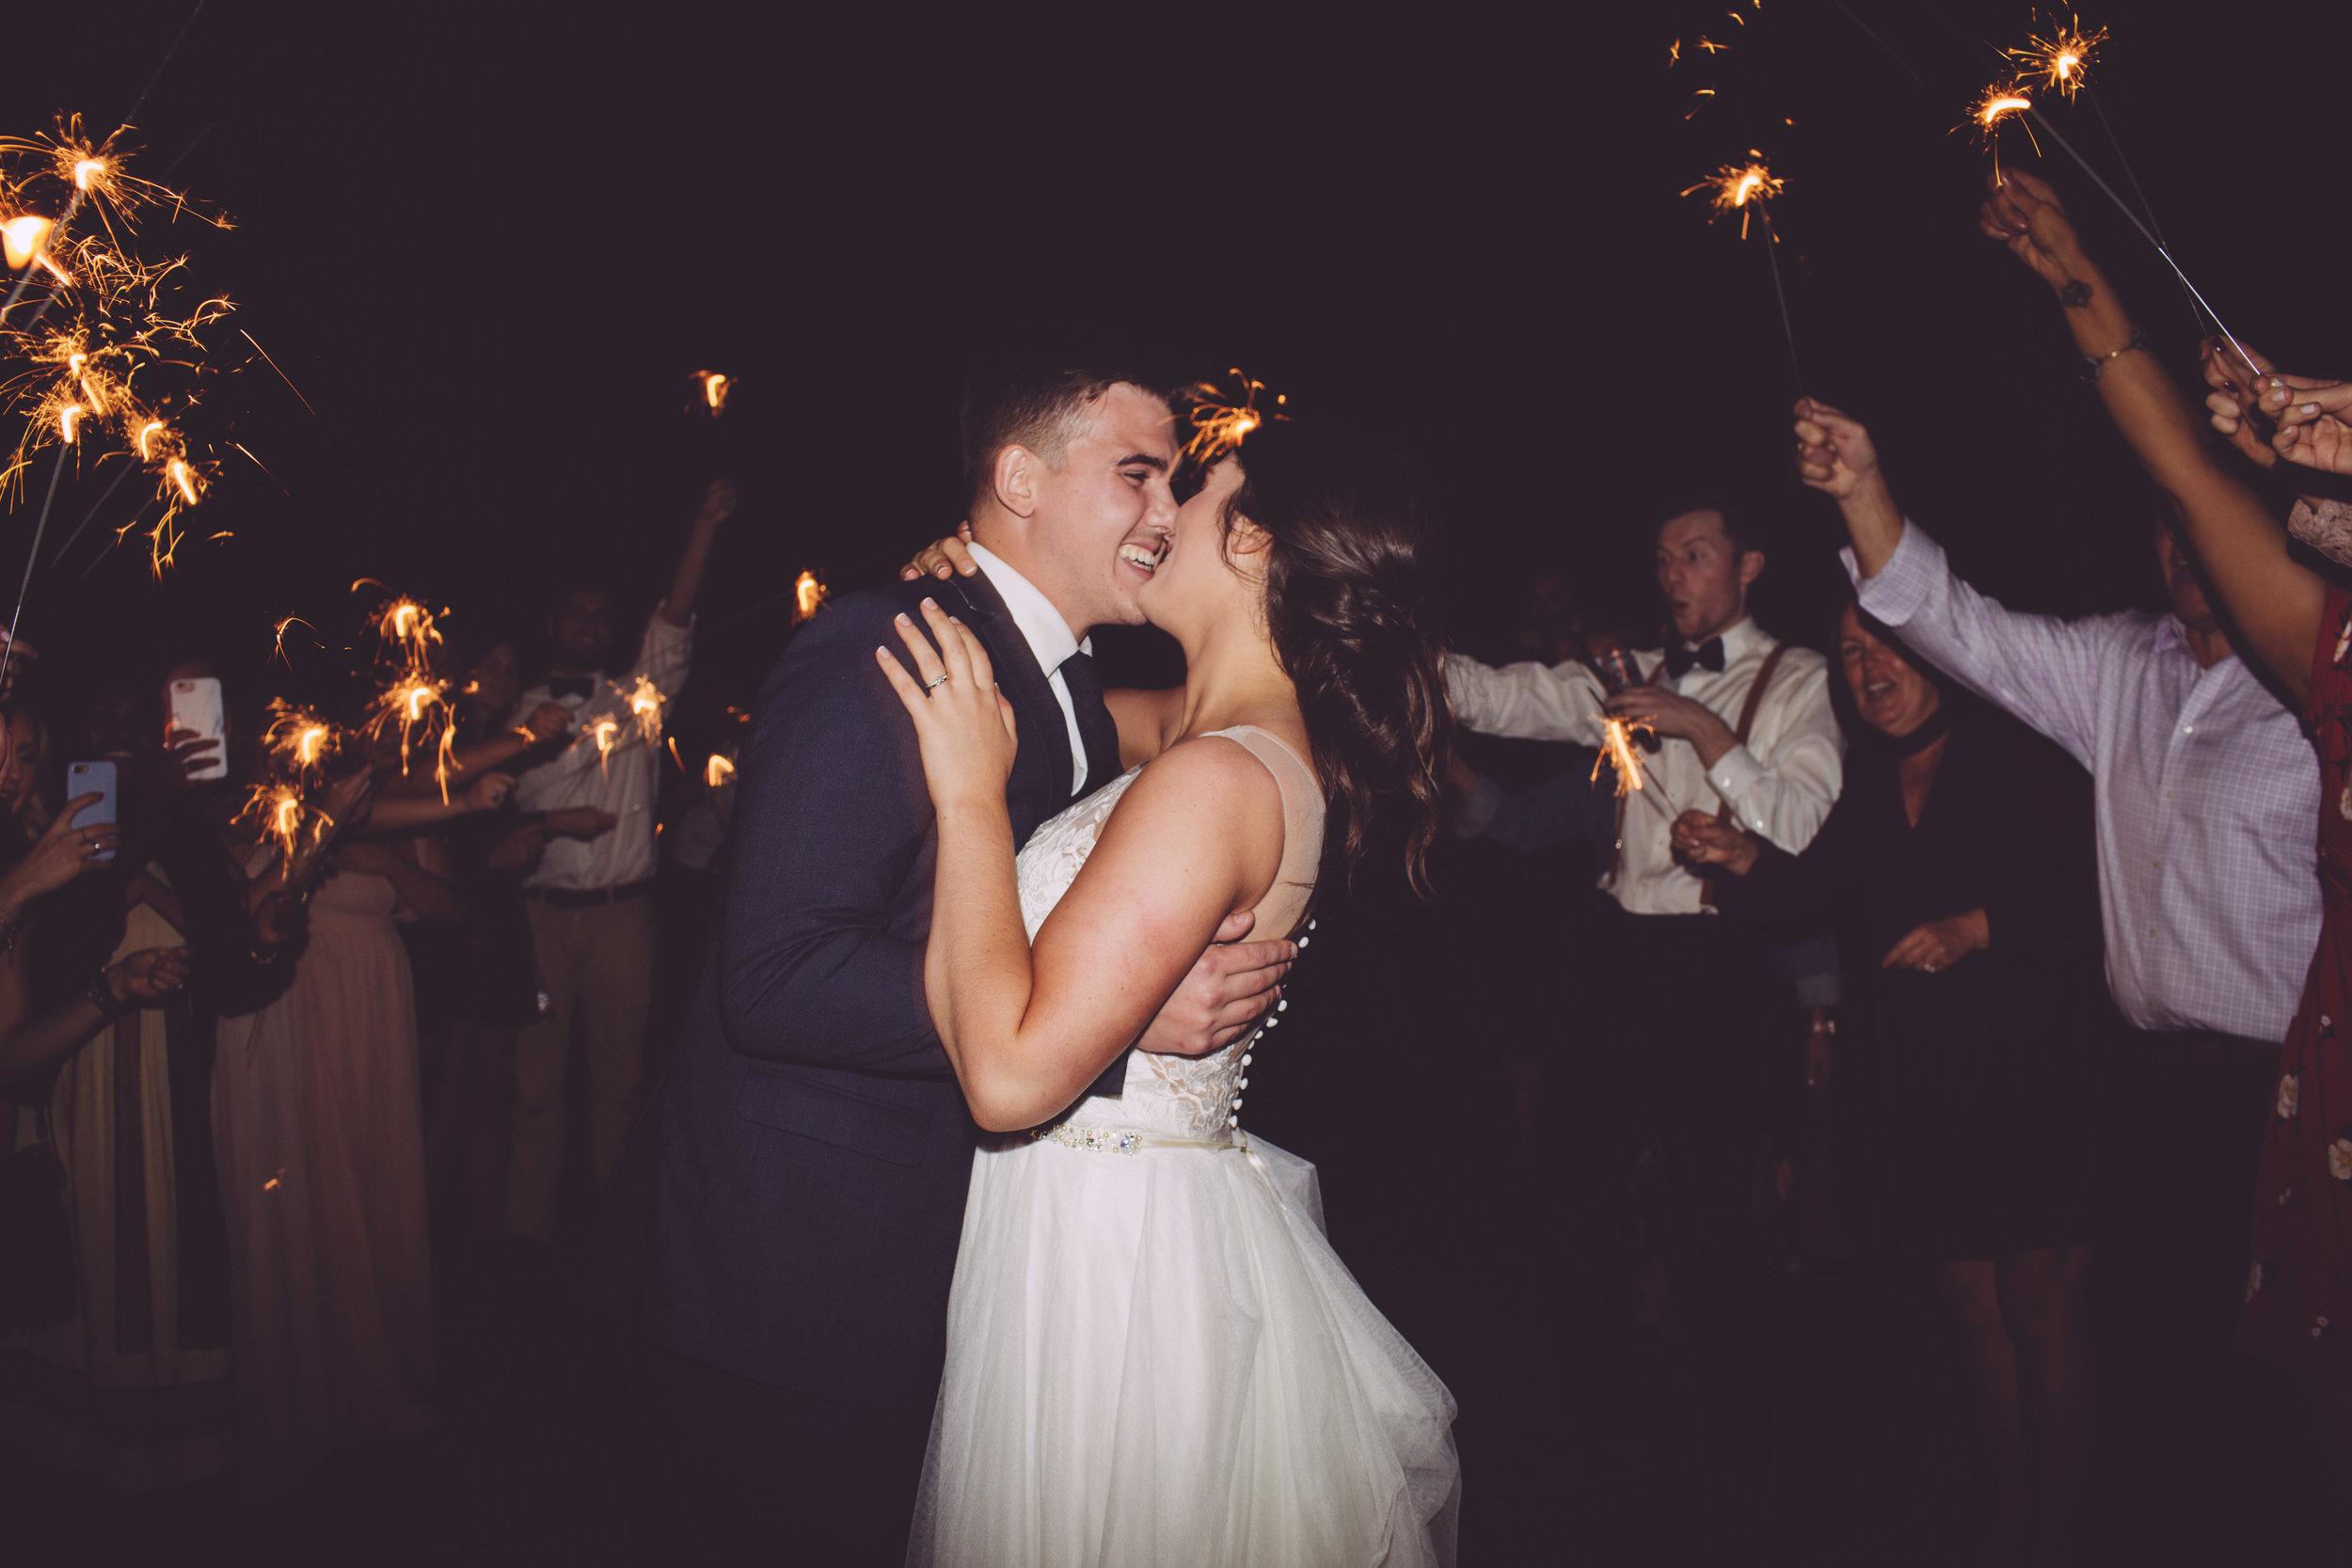 bride and groom dancing spokane real wedding